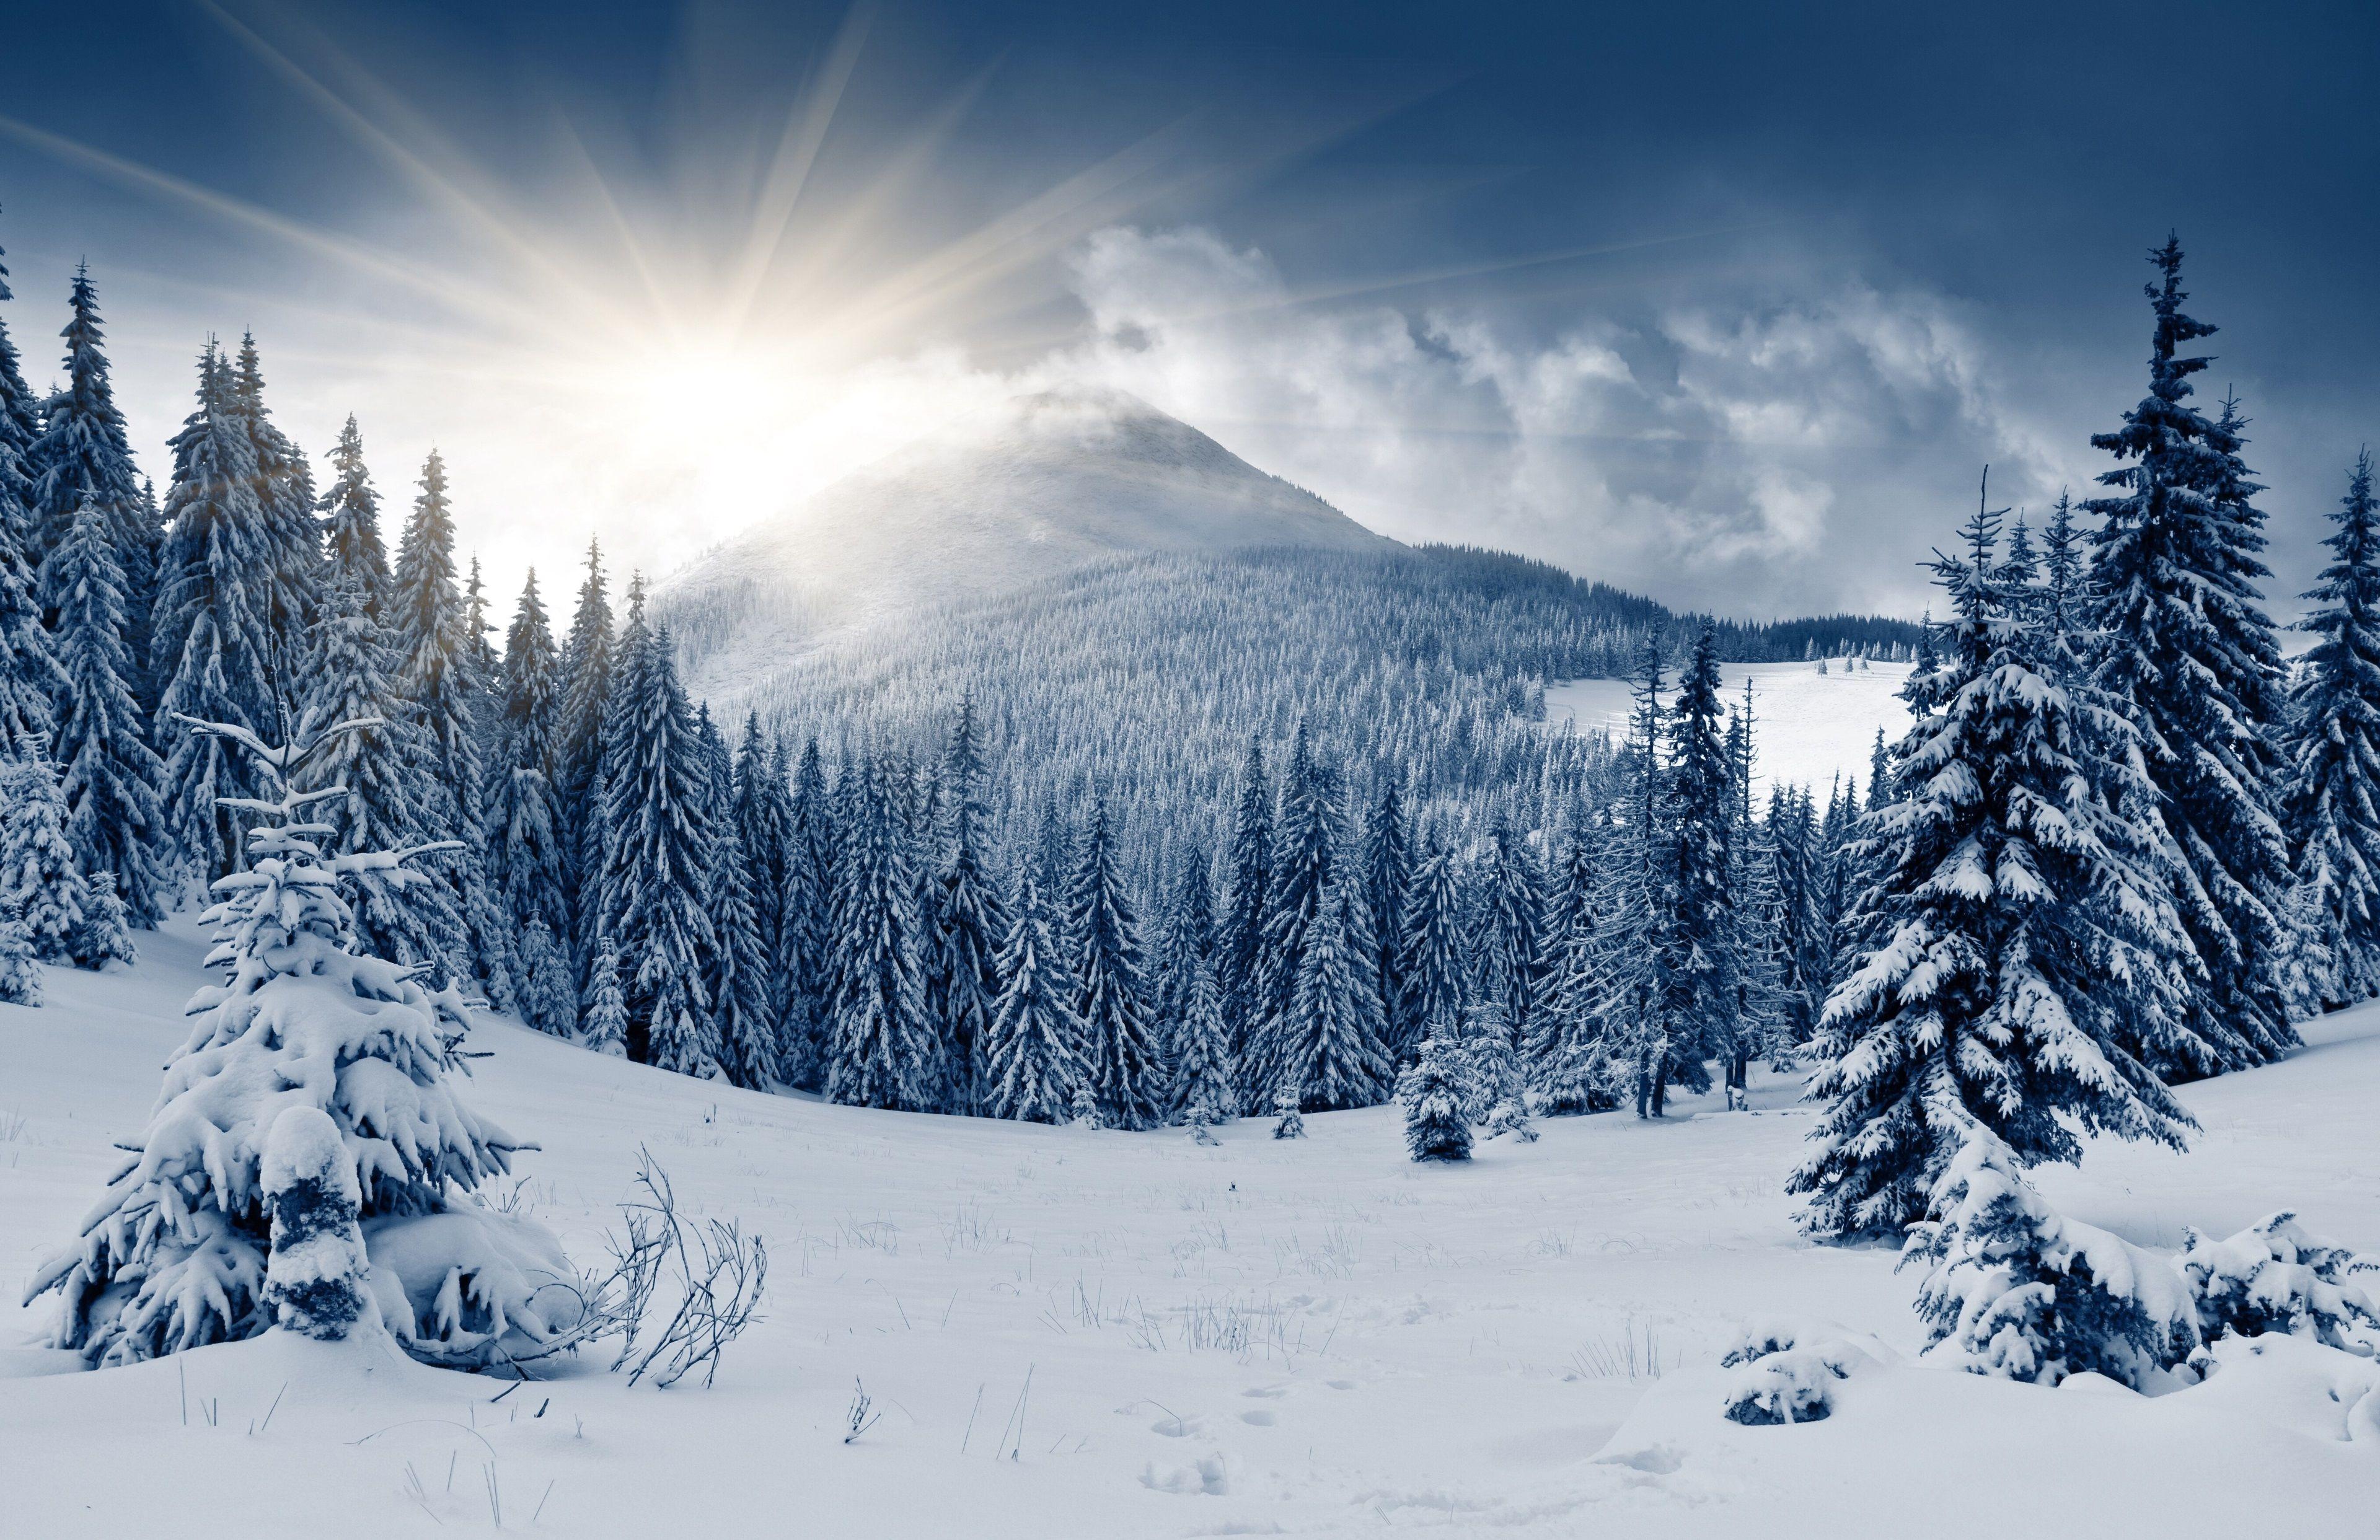 3840x2485 winter forest 4k free desktop wallpaper Зимние